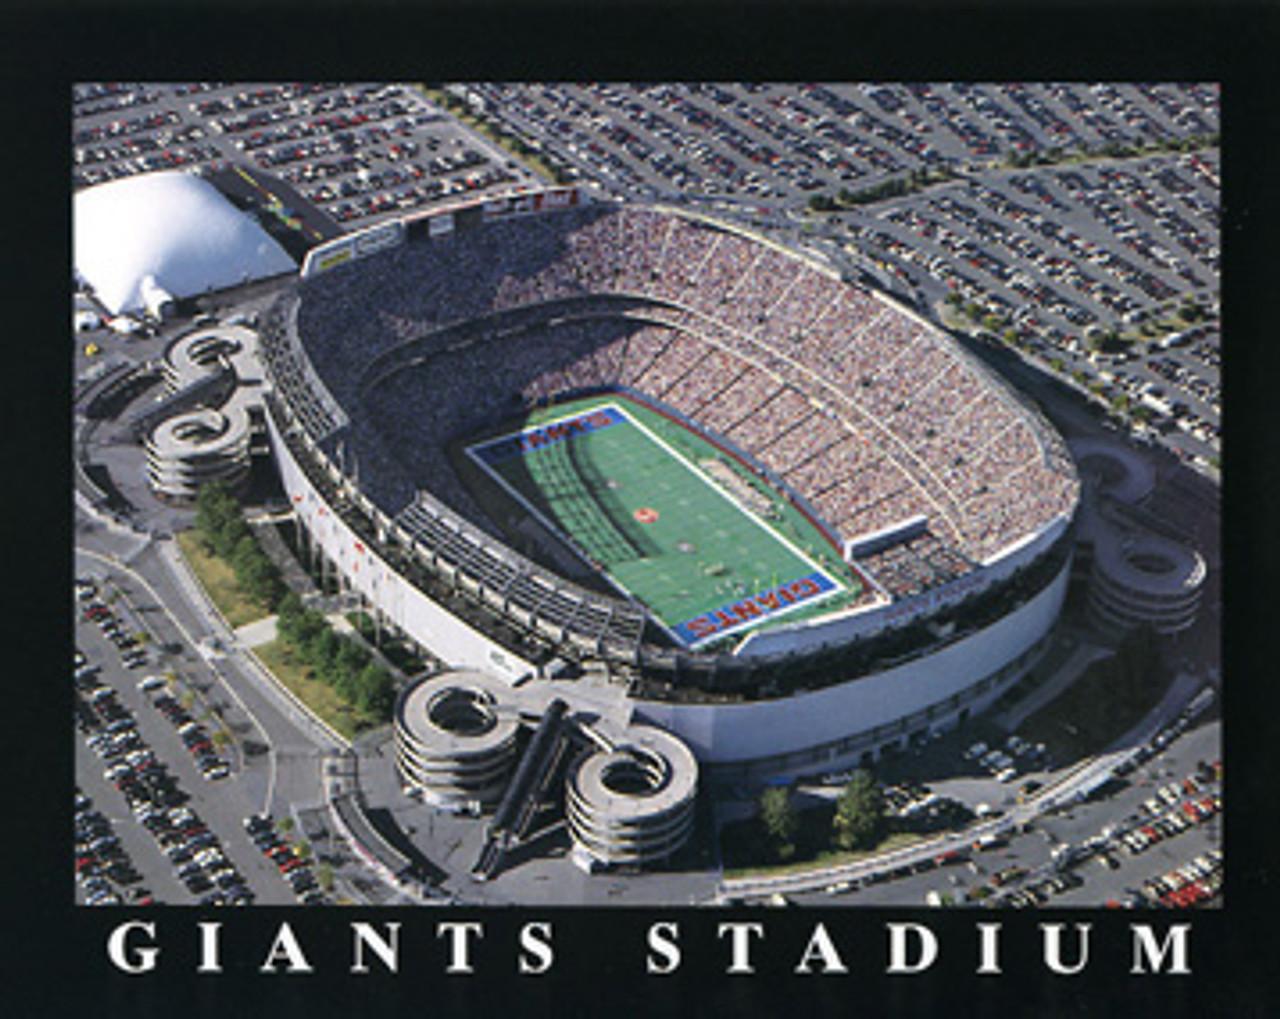 Giants Stadium New York Giants Aerial Poster